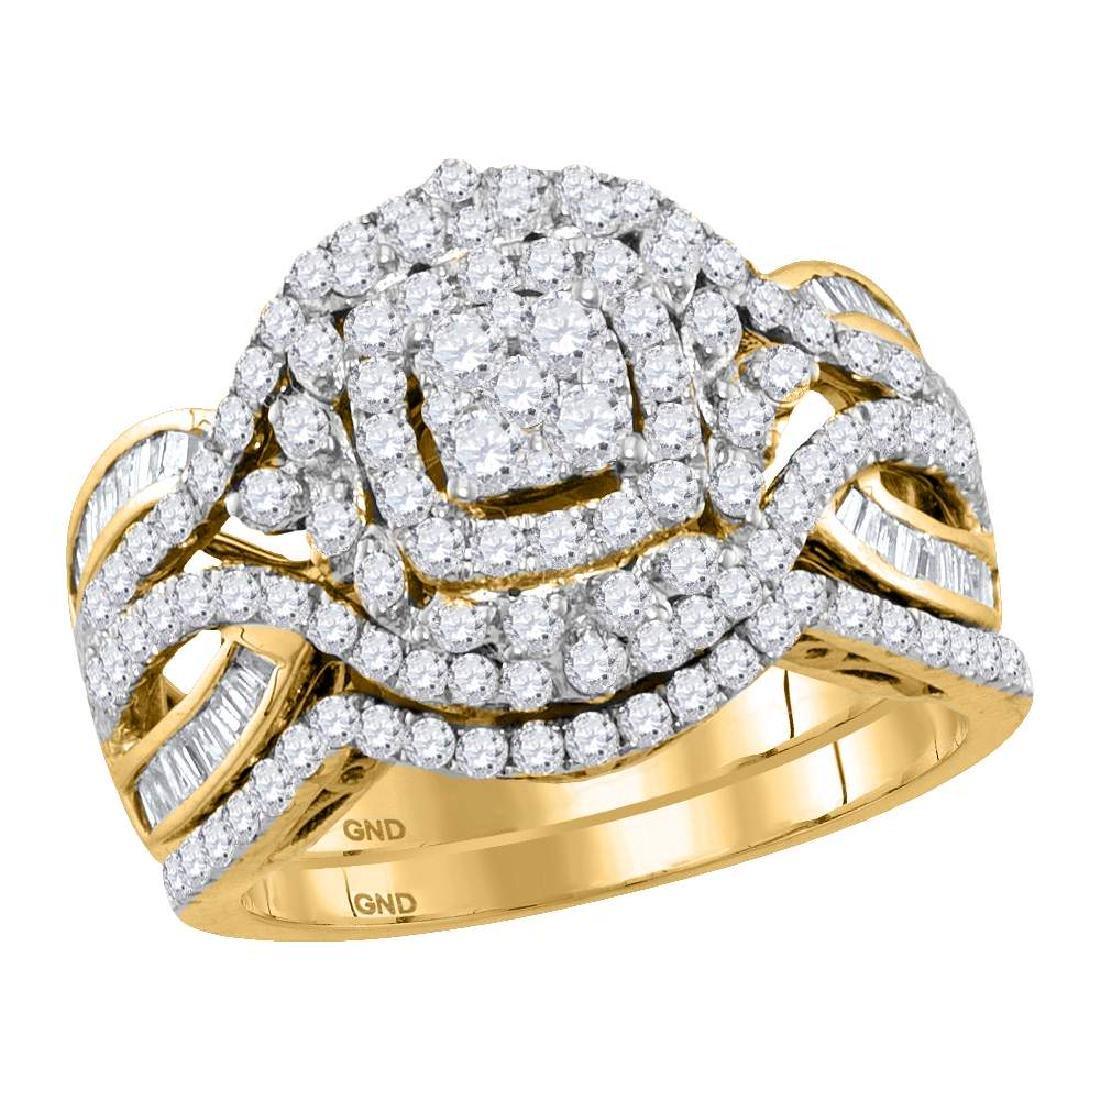 1.48 CTW Diamond Bridal Wedding Engagement Ring 14KT